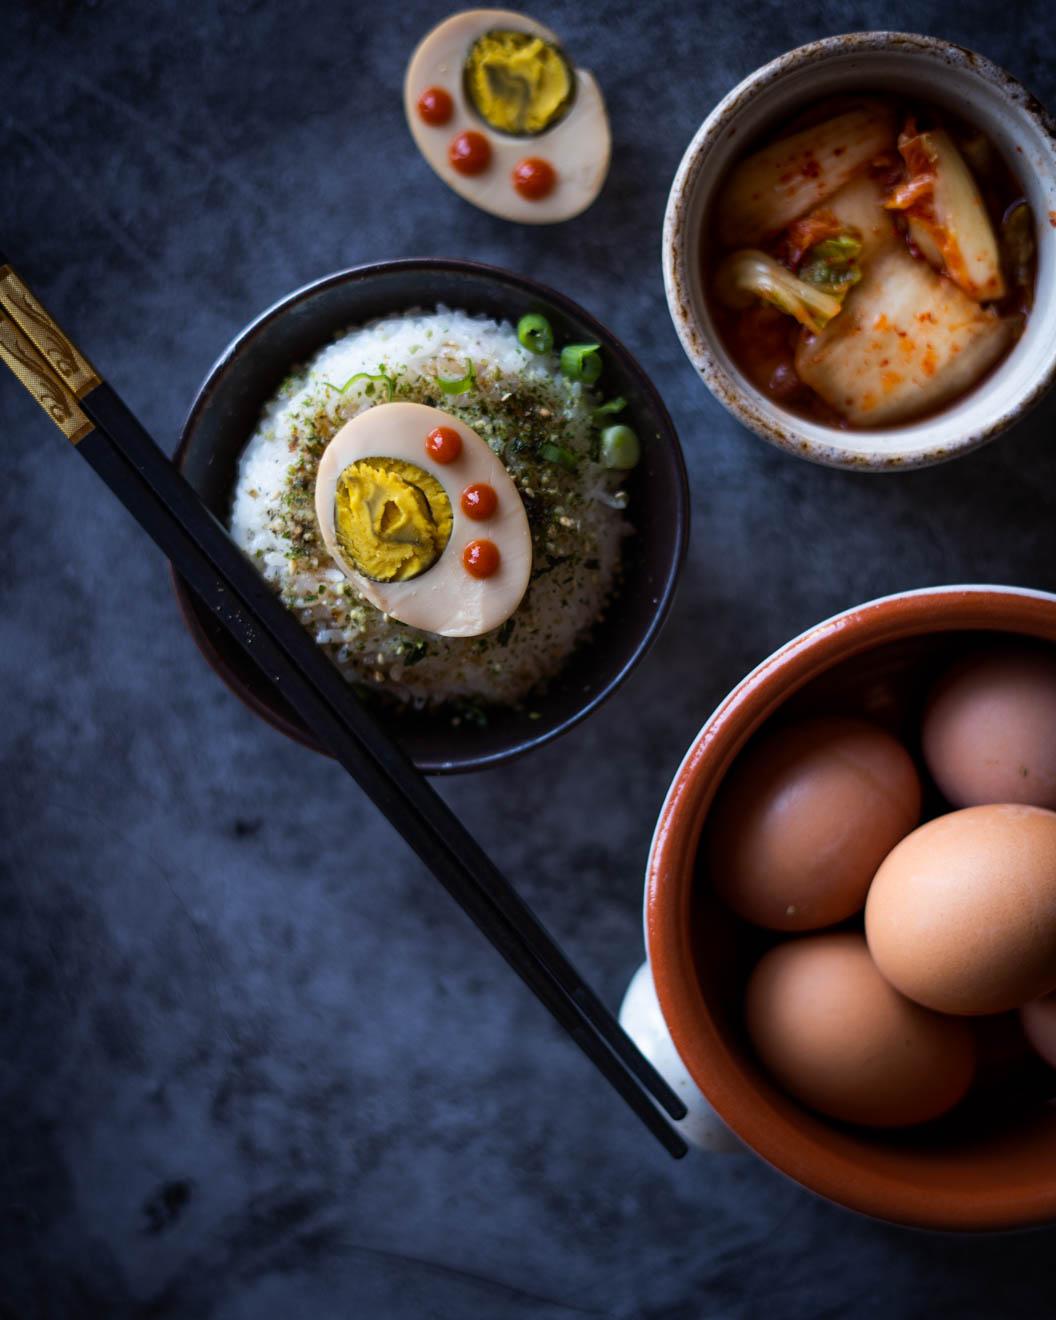 Korean Sauna Eggs The Balanced Wifestyle